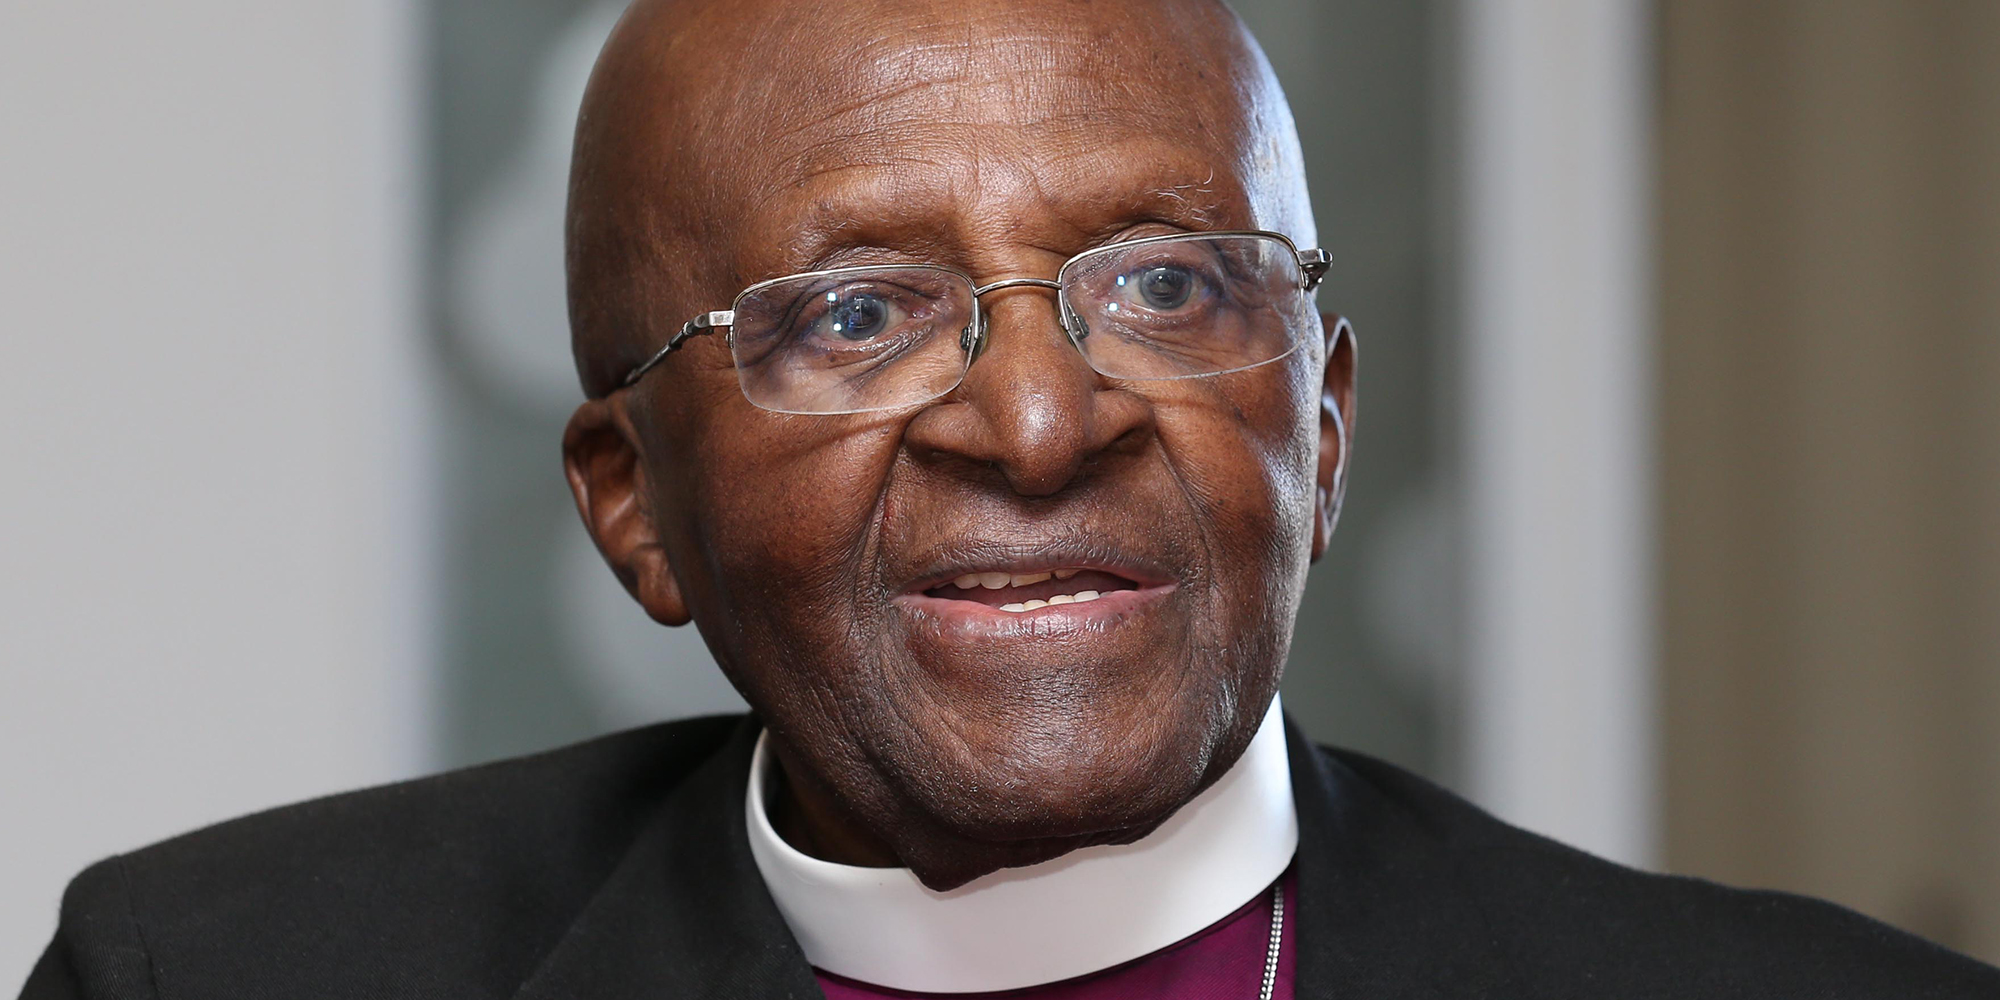 OP-ED: DESMOND TUTU AT 90: 'I wish I could shut up, but I can't, and I won't': The global legacy of Archbishop Emeritus Desmond Tutu